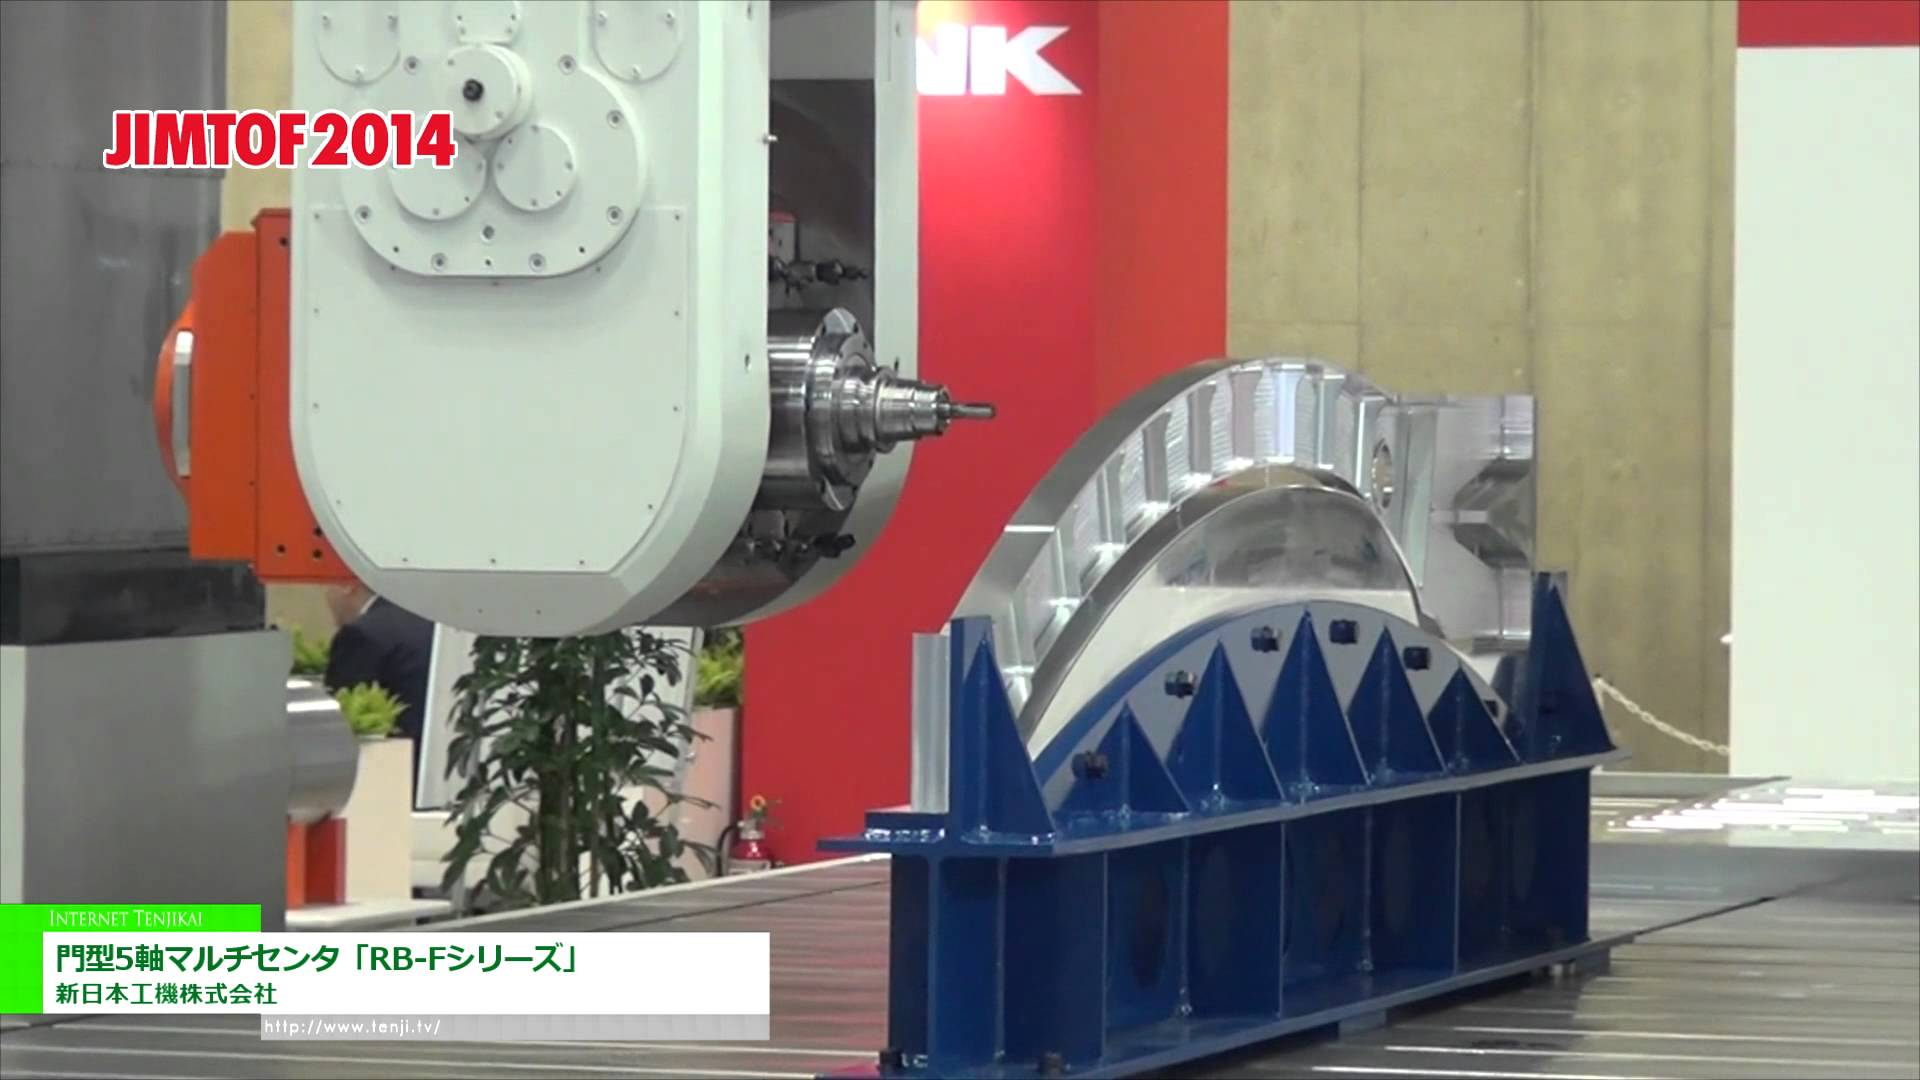 [JIMTOF 2014] 門型5軸マルチセンタ「RB-Fシリーズ」 – 新日本工機株式会社